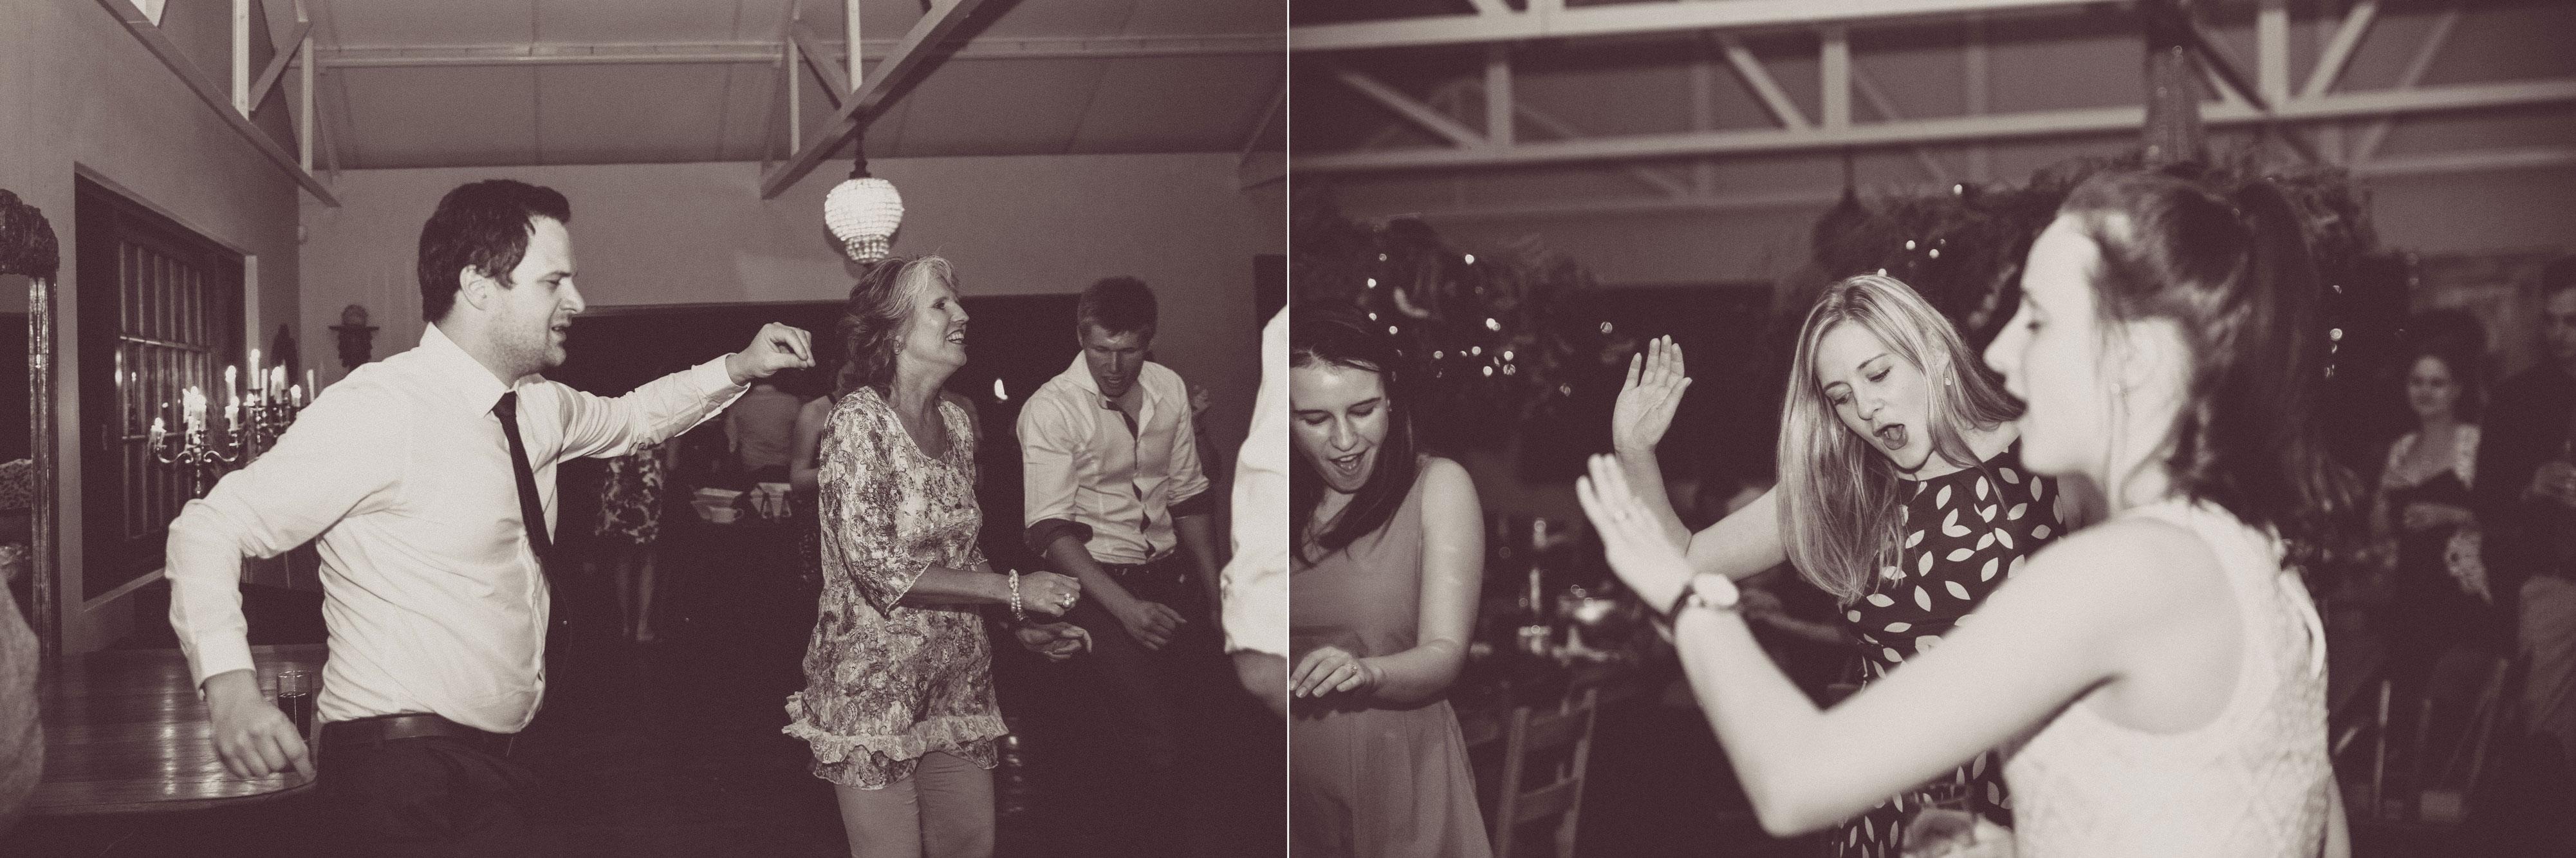 The Nutcracker_Wedding Photography_Maryke Albertyn 56